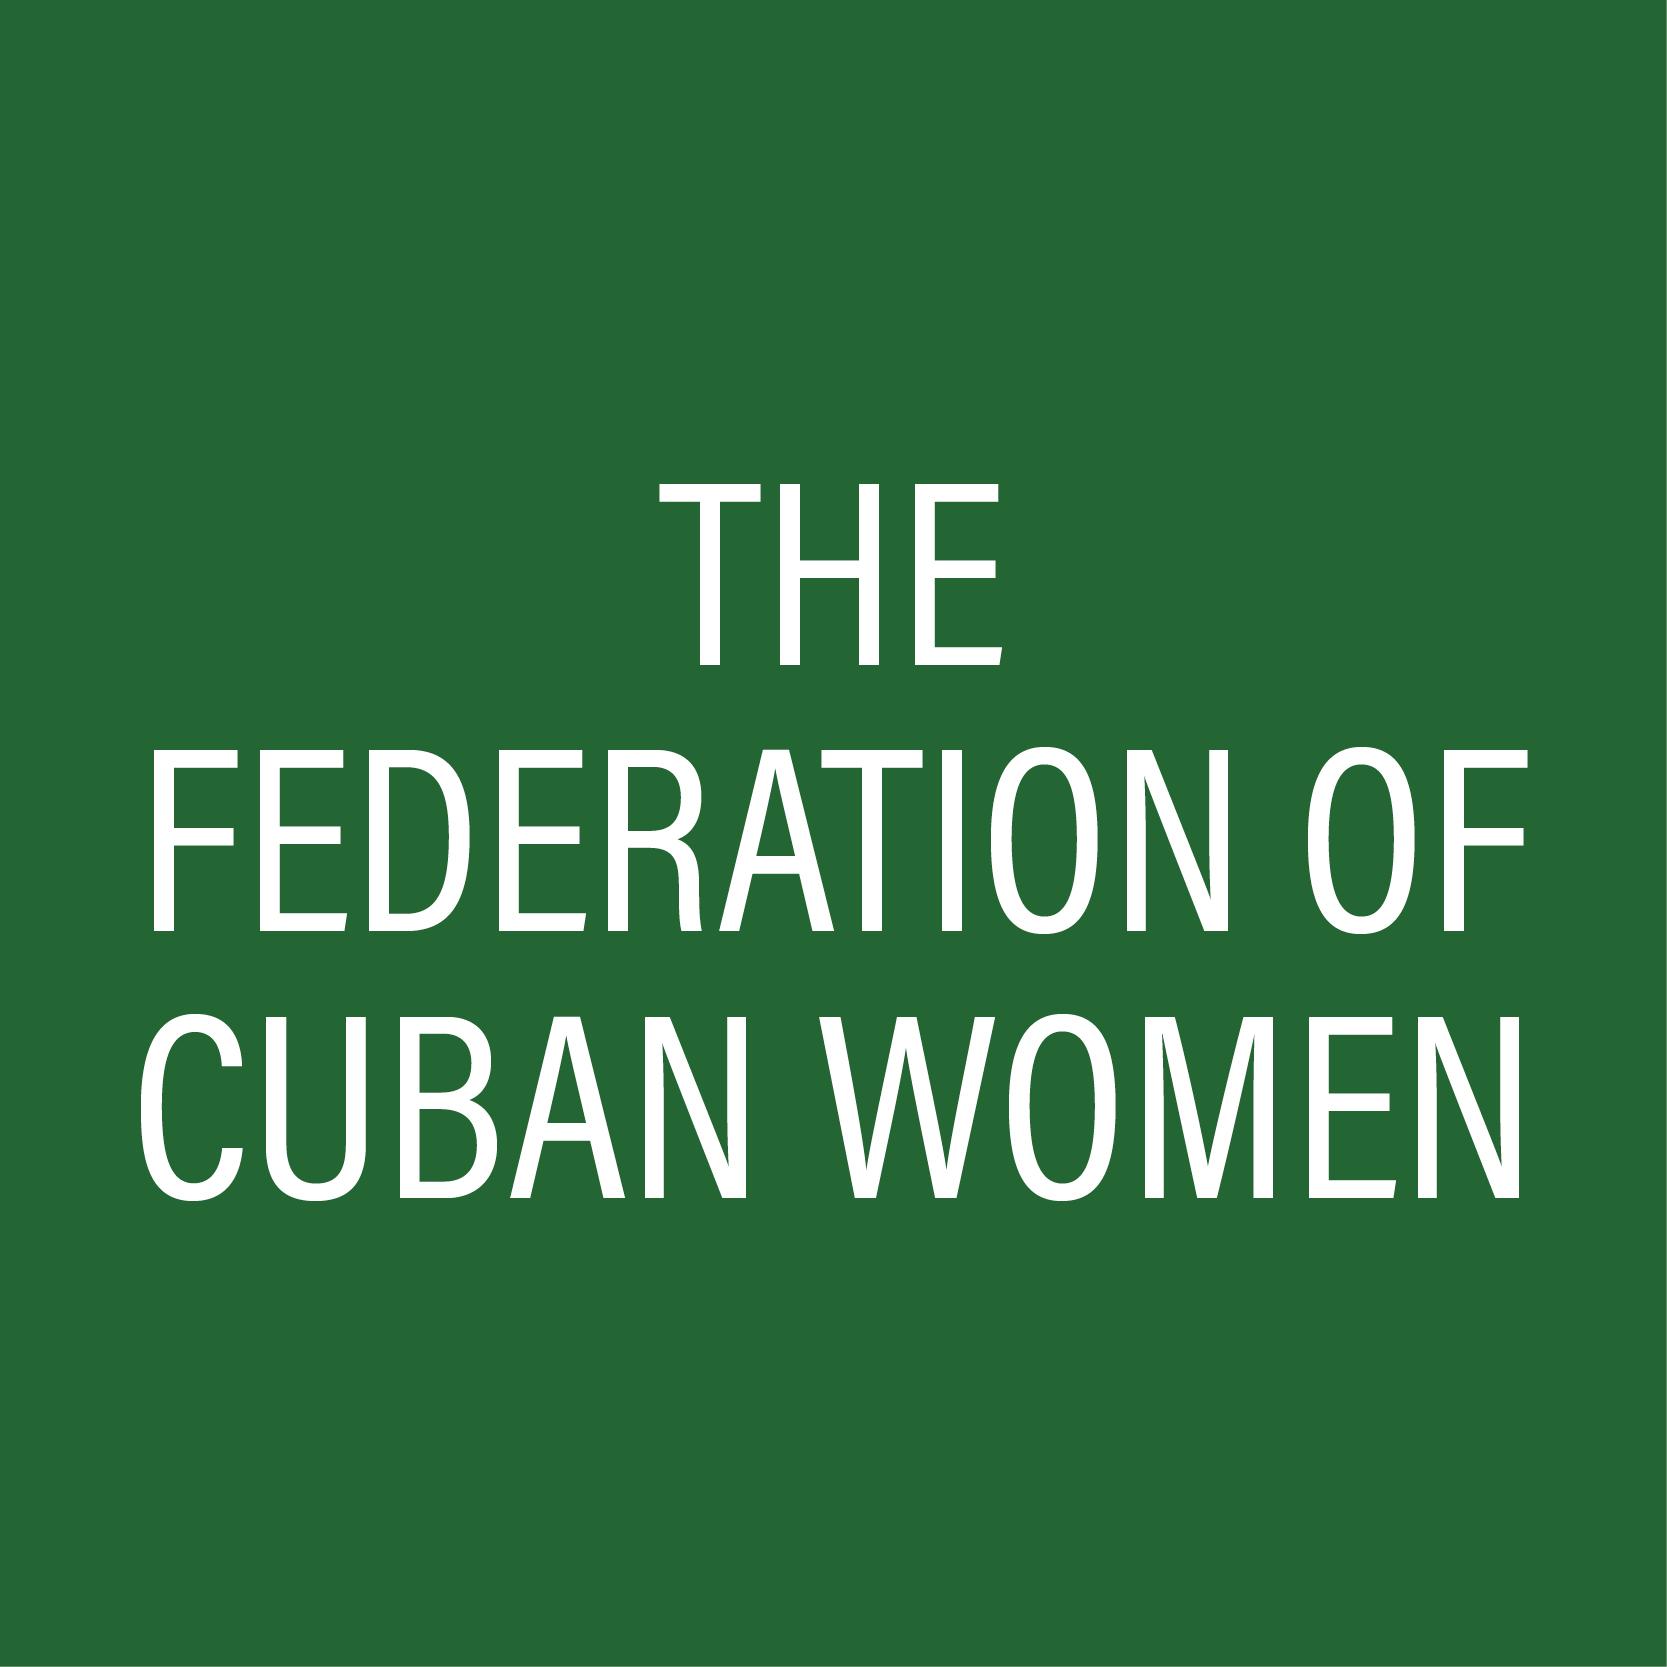 Federation of Cuban Women.jpg